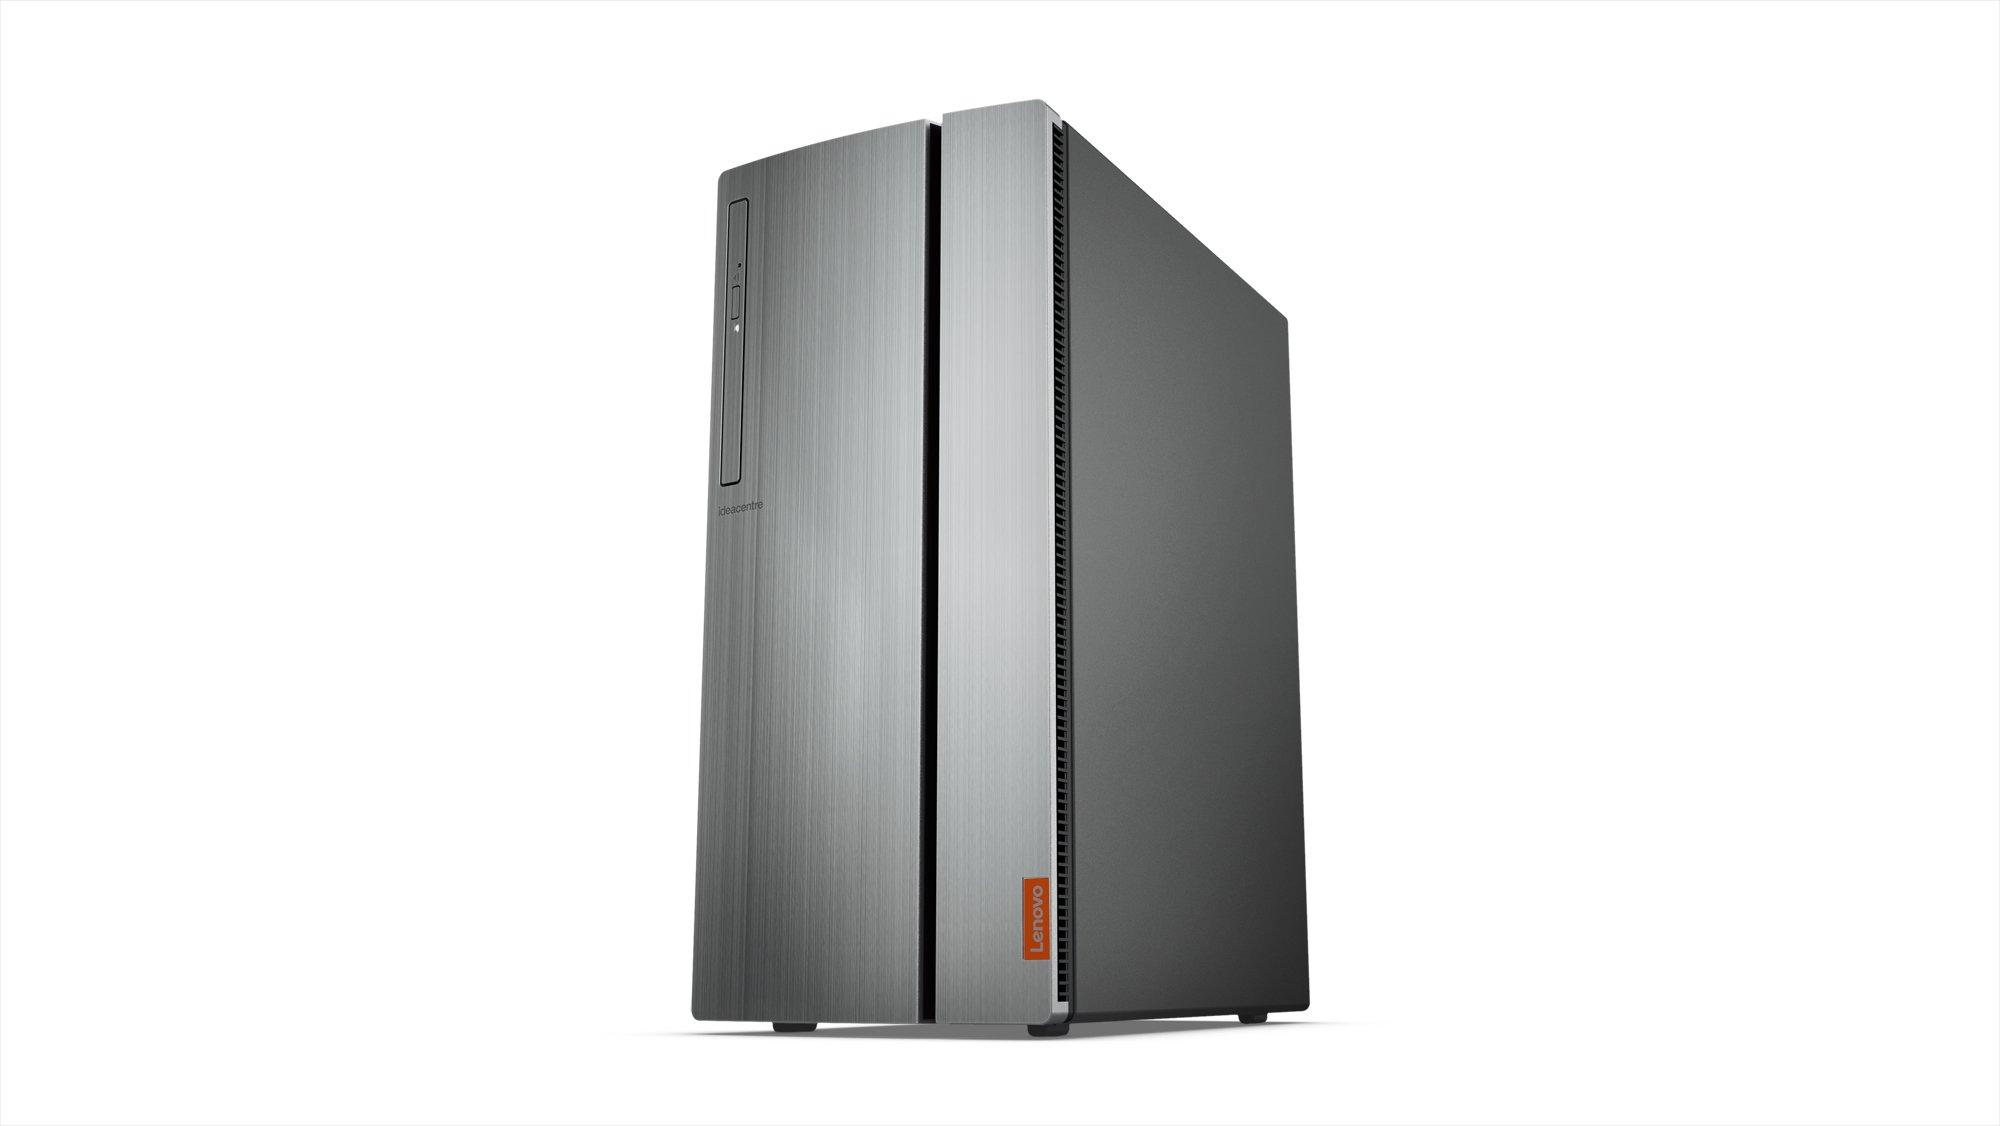 Lenovo Ideacentre 720 18L Desktop (Intel Core i7-7700, 12GB DDR4, 128GB SSD, 1 TB HDD, Nvidia GeForce GTX 1050Ti, Windows 10 Home), 90H00006US by Lenovo